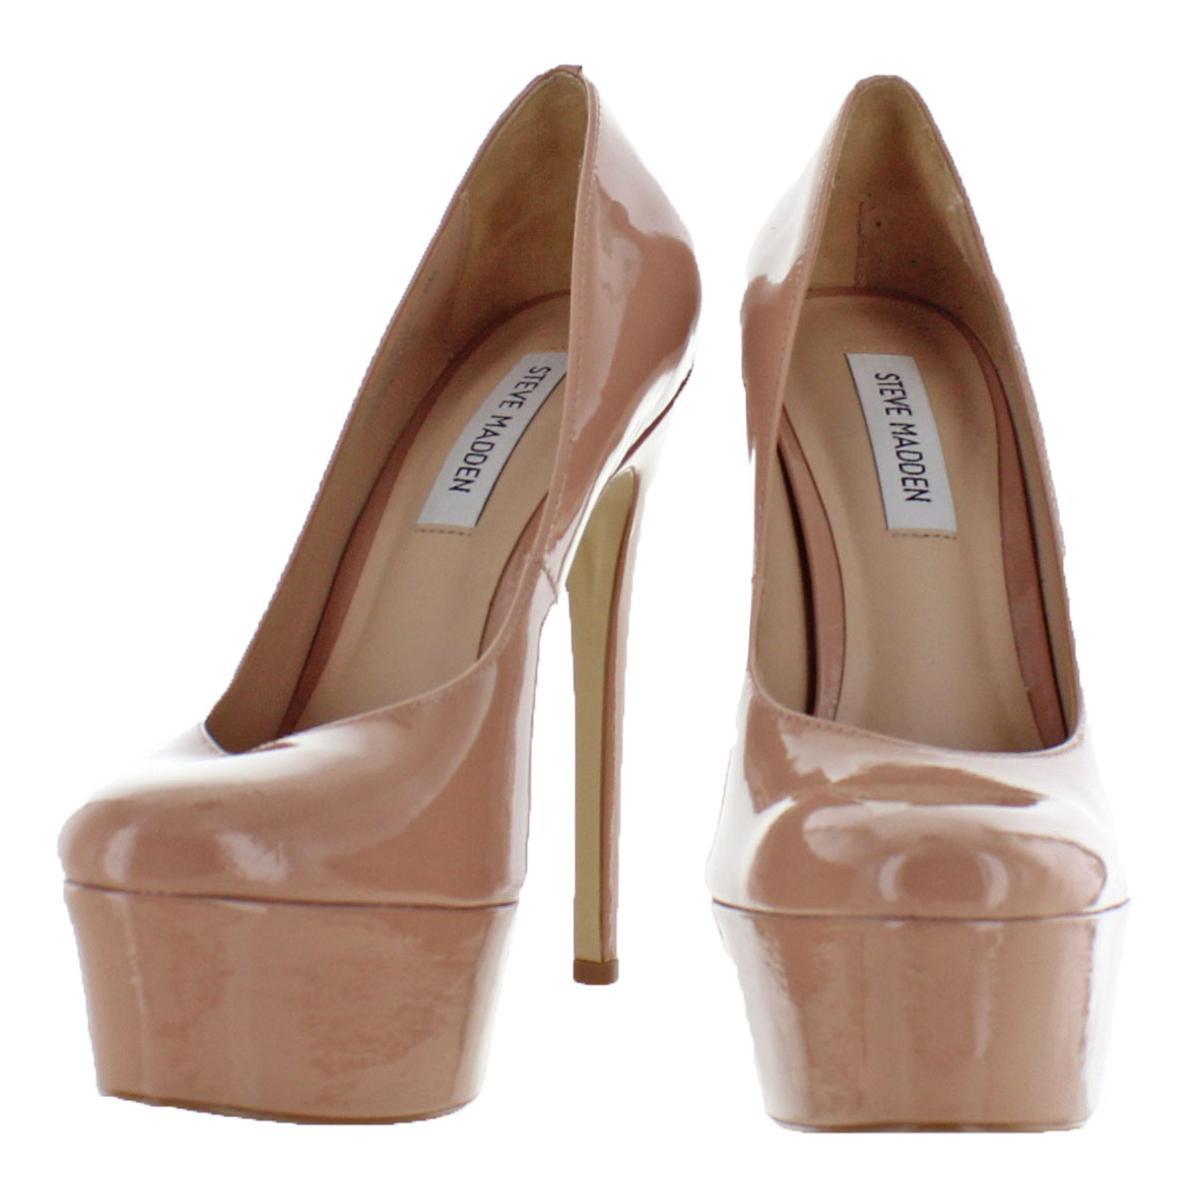 Steve-Madden-Womens-Deserve-Solid-Dress-Pumps-Platforms-BHFO-0713 thumbnail 8